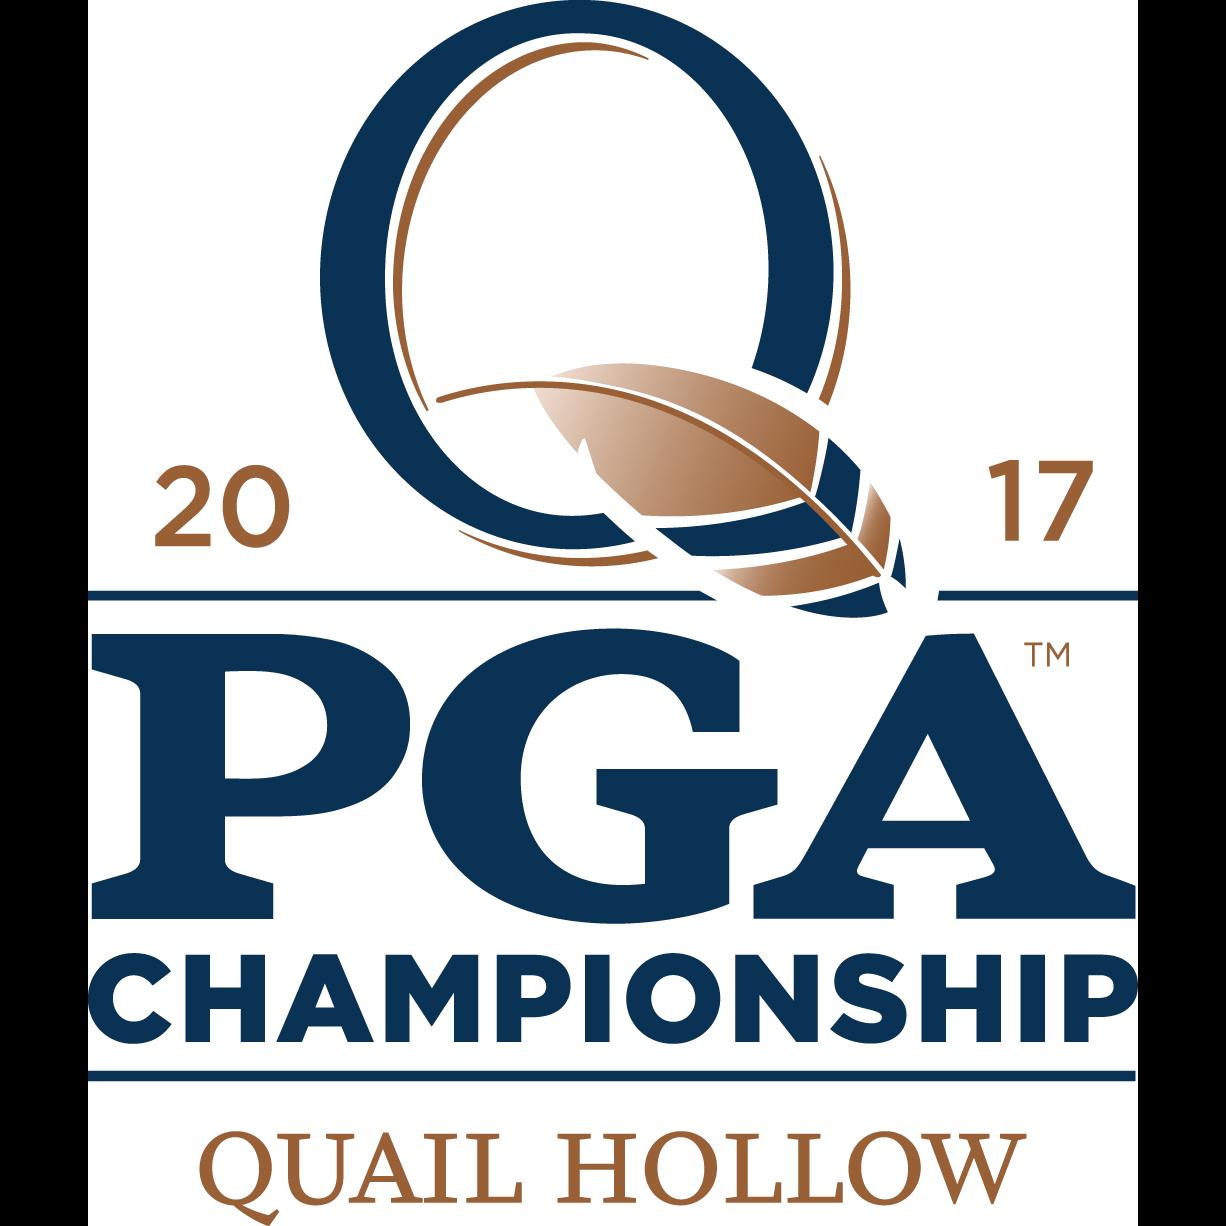 2017 Golf Major Championships - PGA Championship